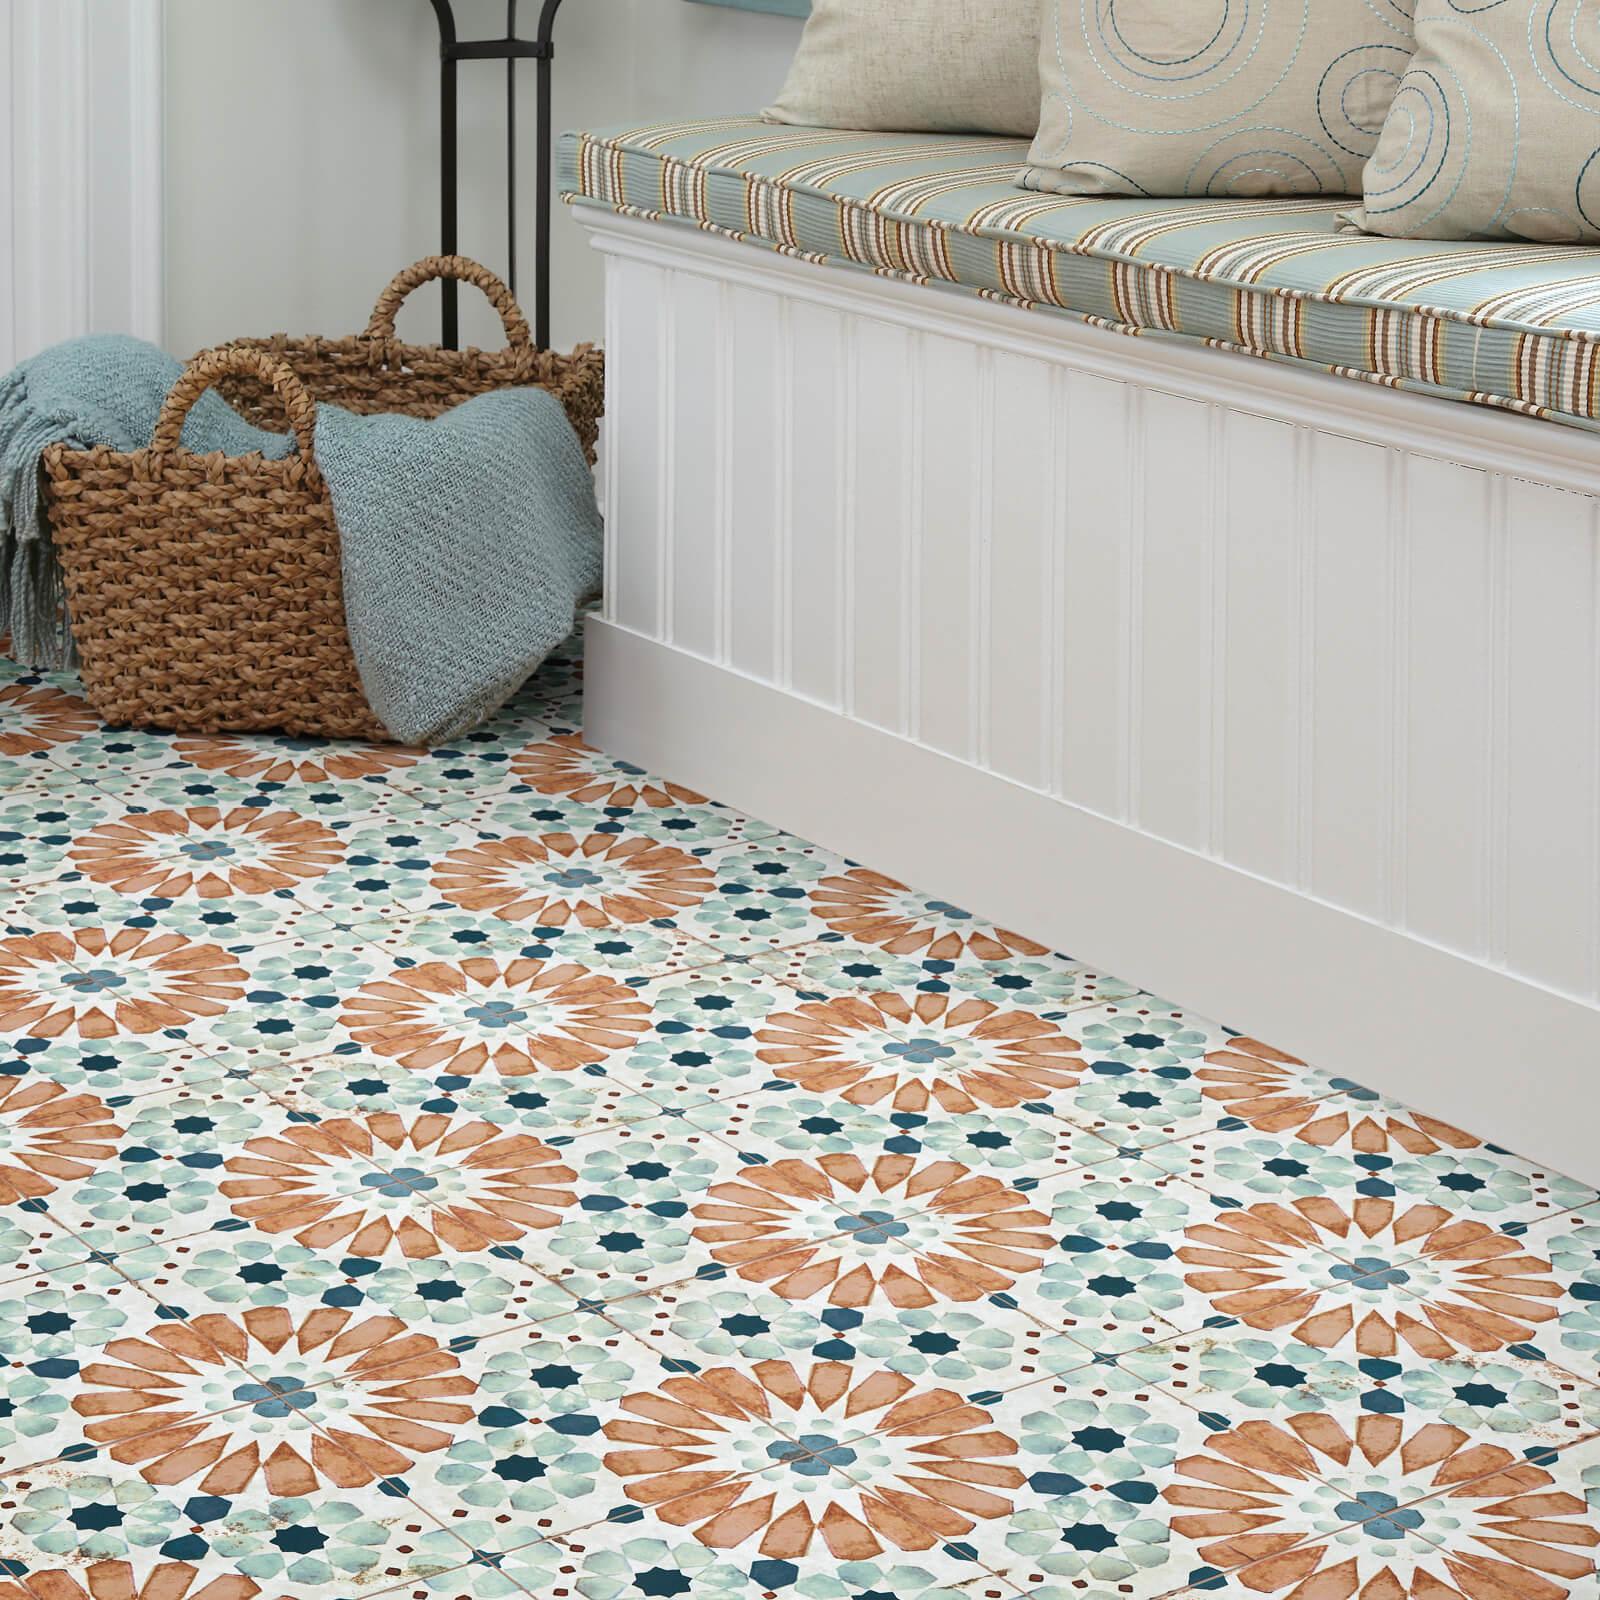 Islander Deco Tile | Terry's Floor Fashions